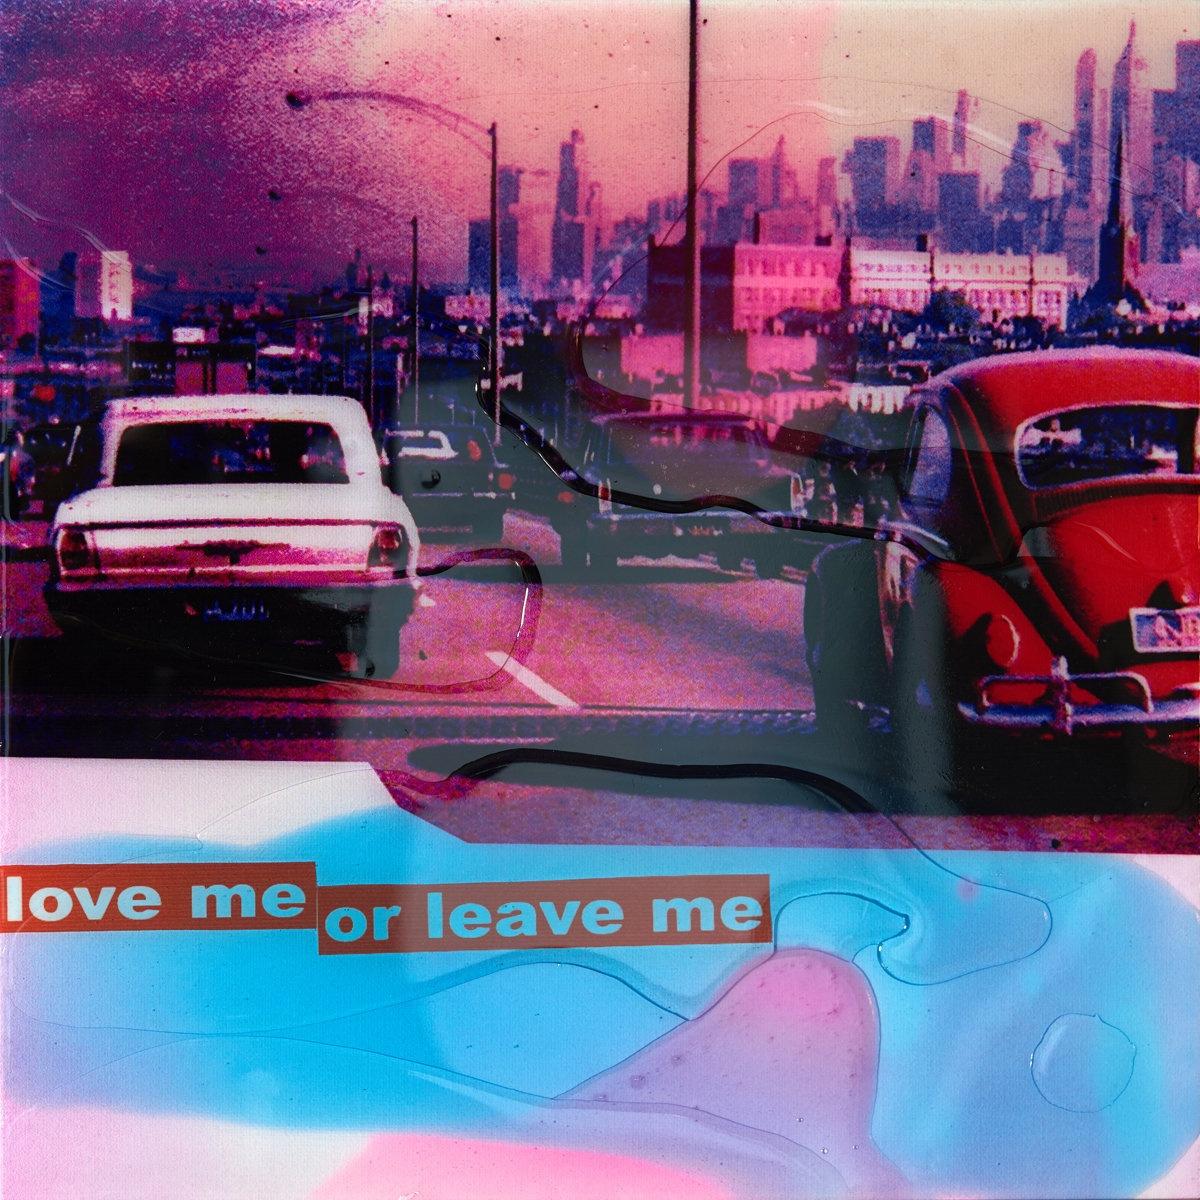 Love me or leave me von Jörg Döring